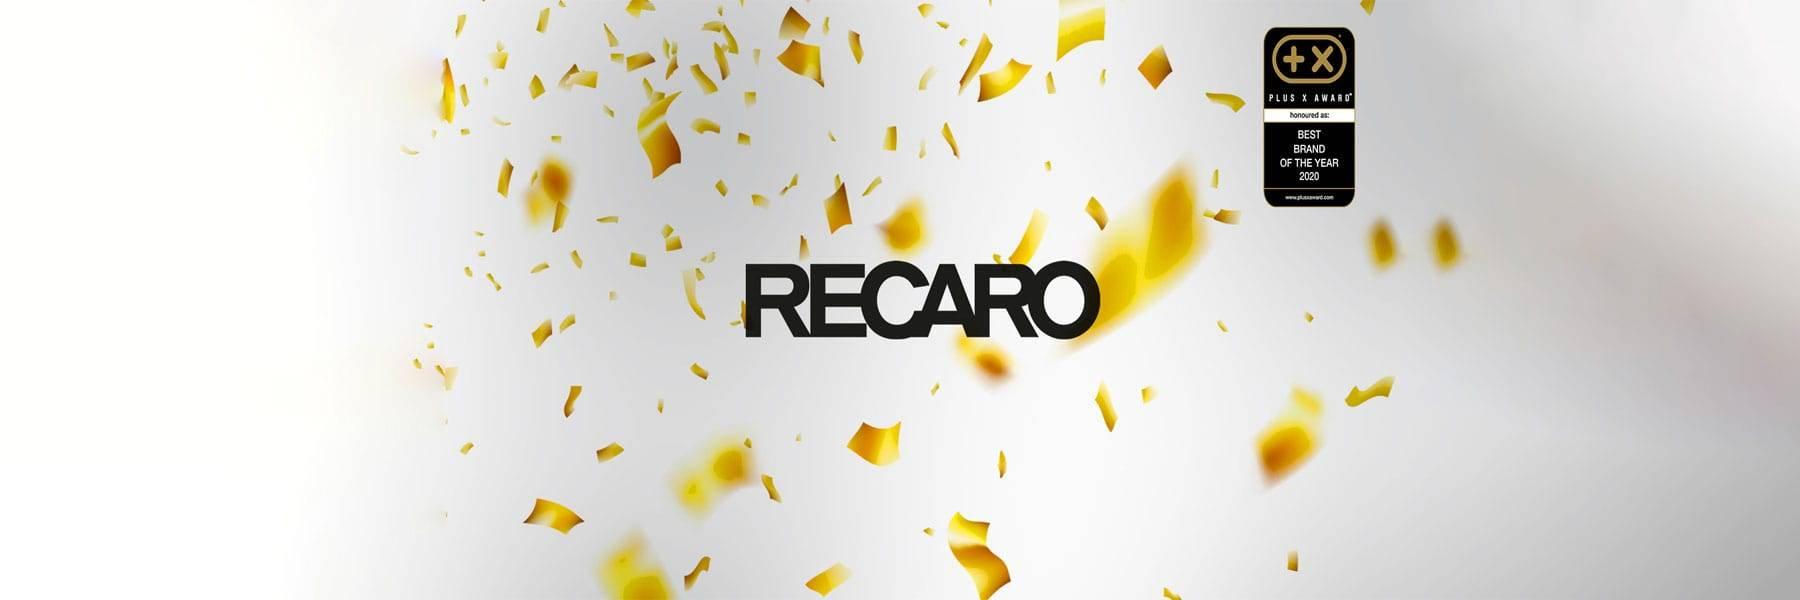 Reacro Baby & Child Car Seats